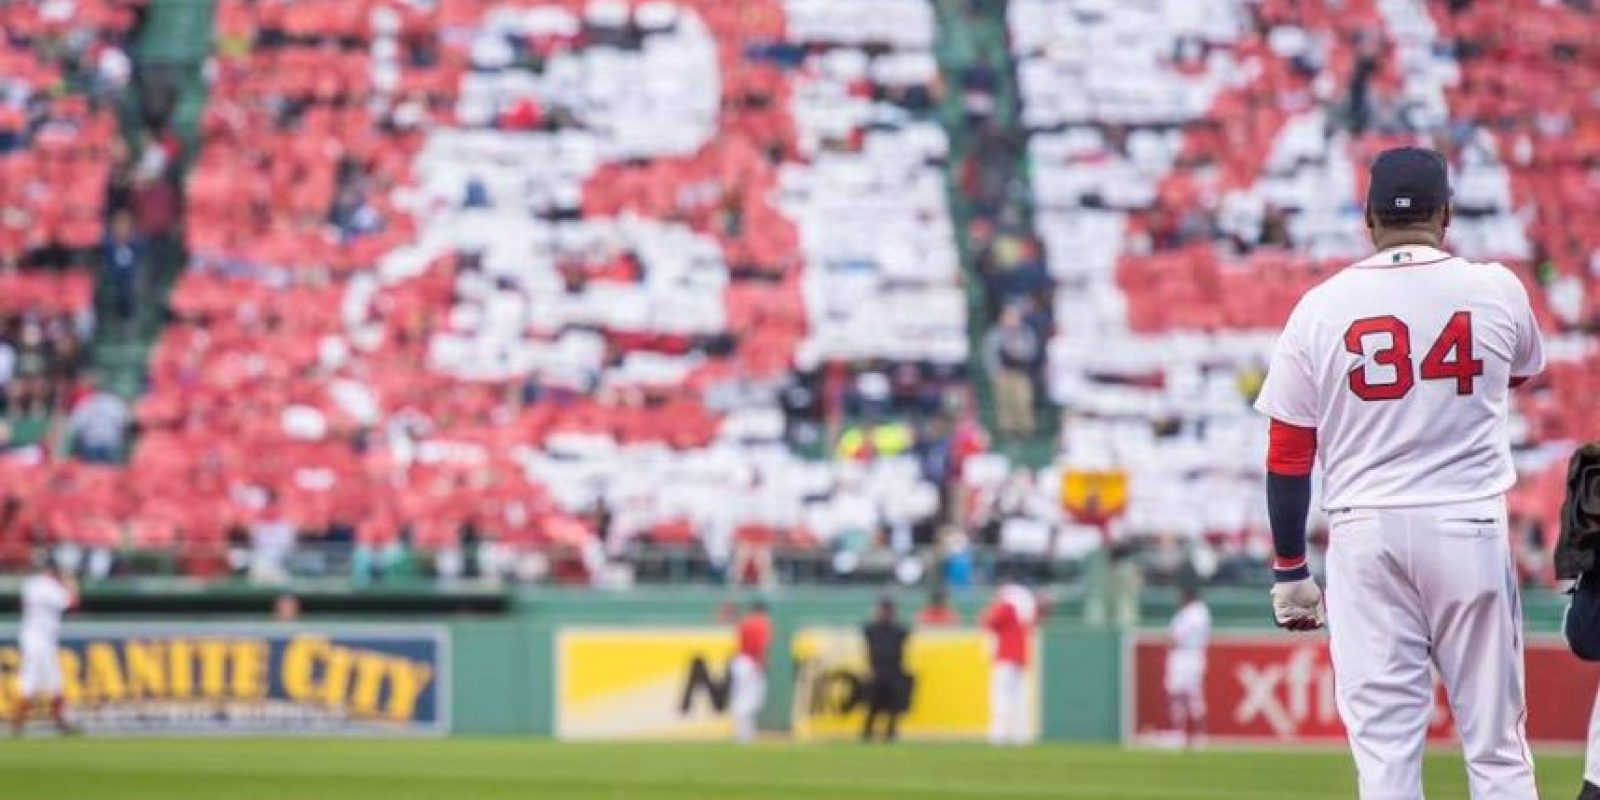 Foto:Facebook Boston Red Sox